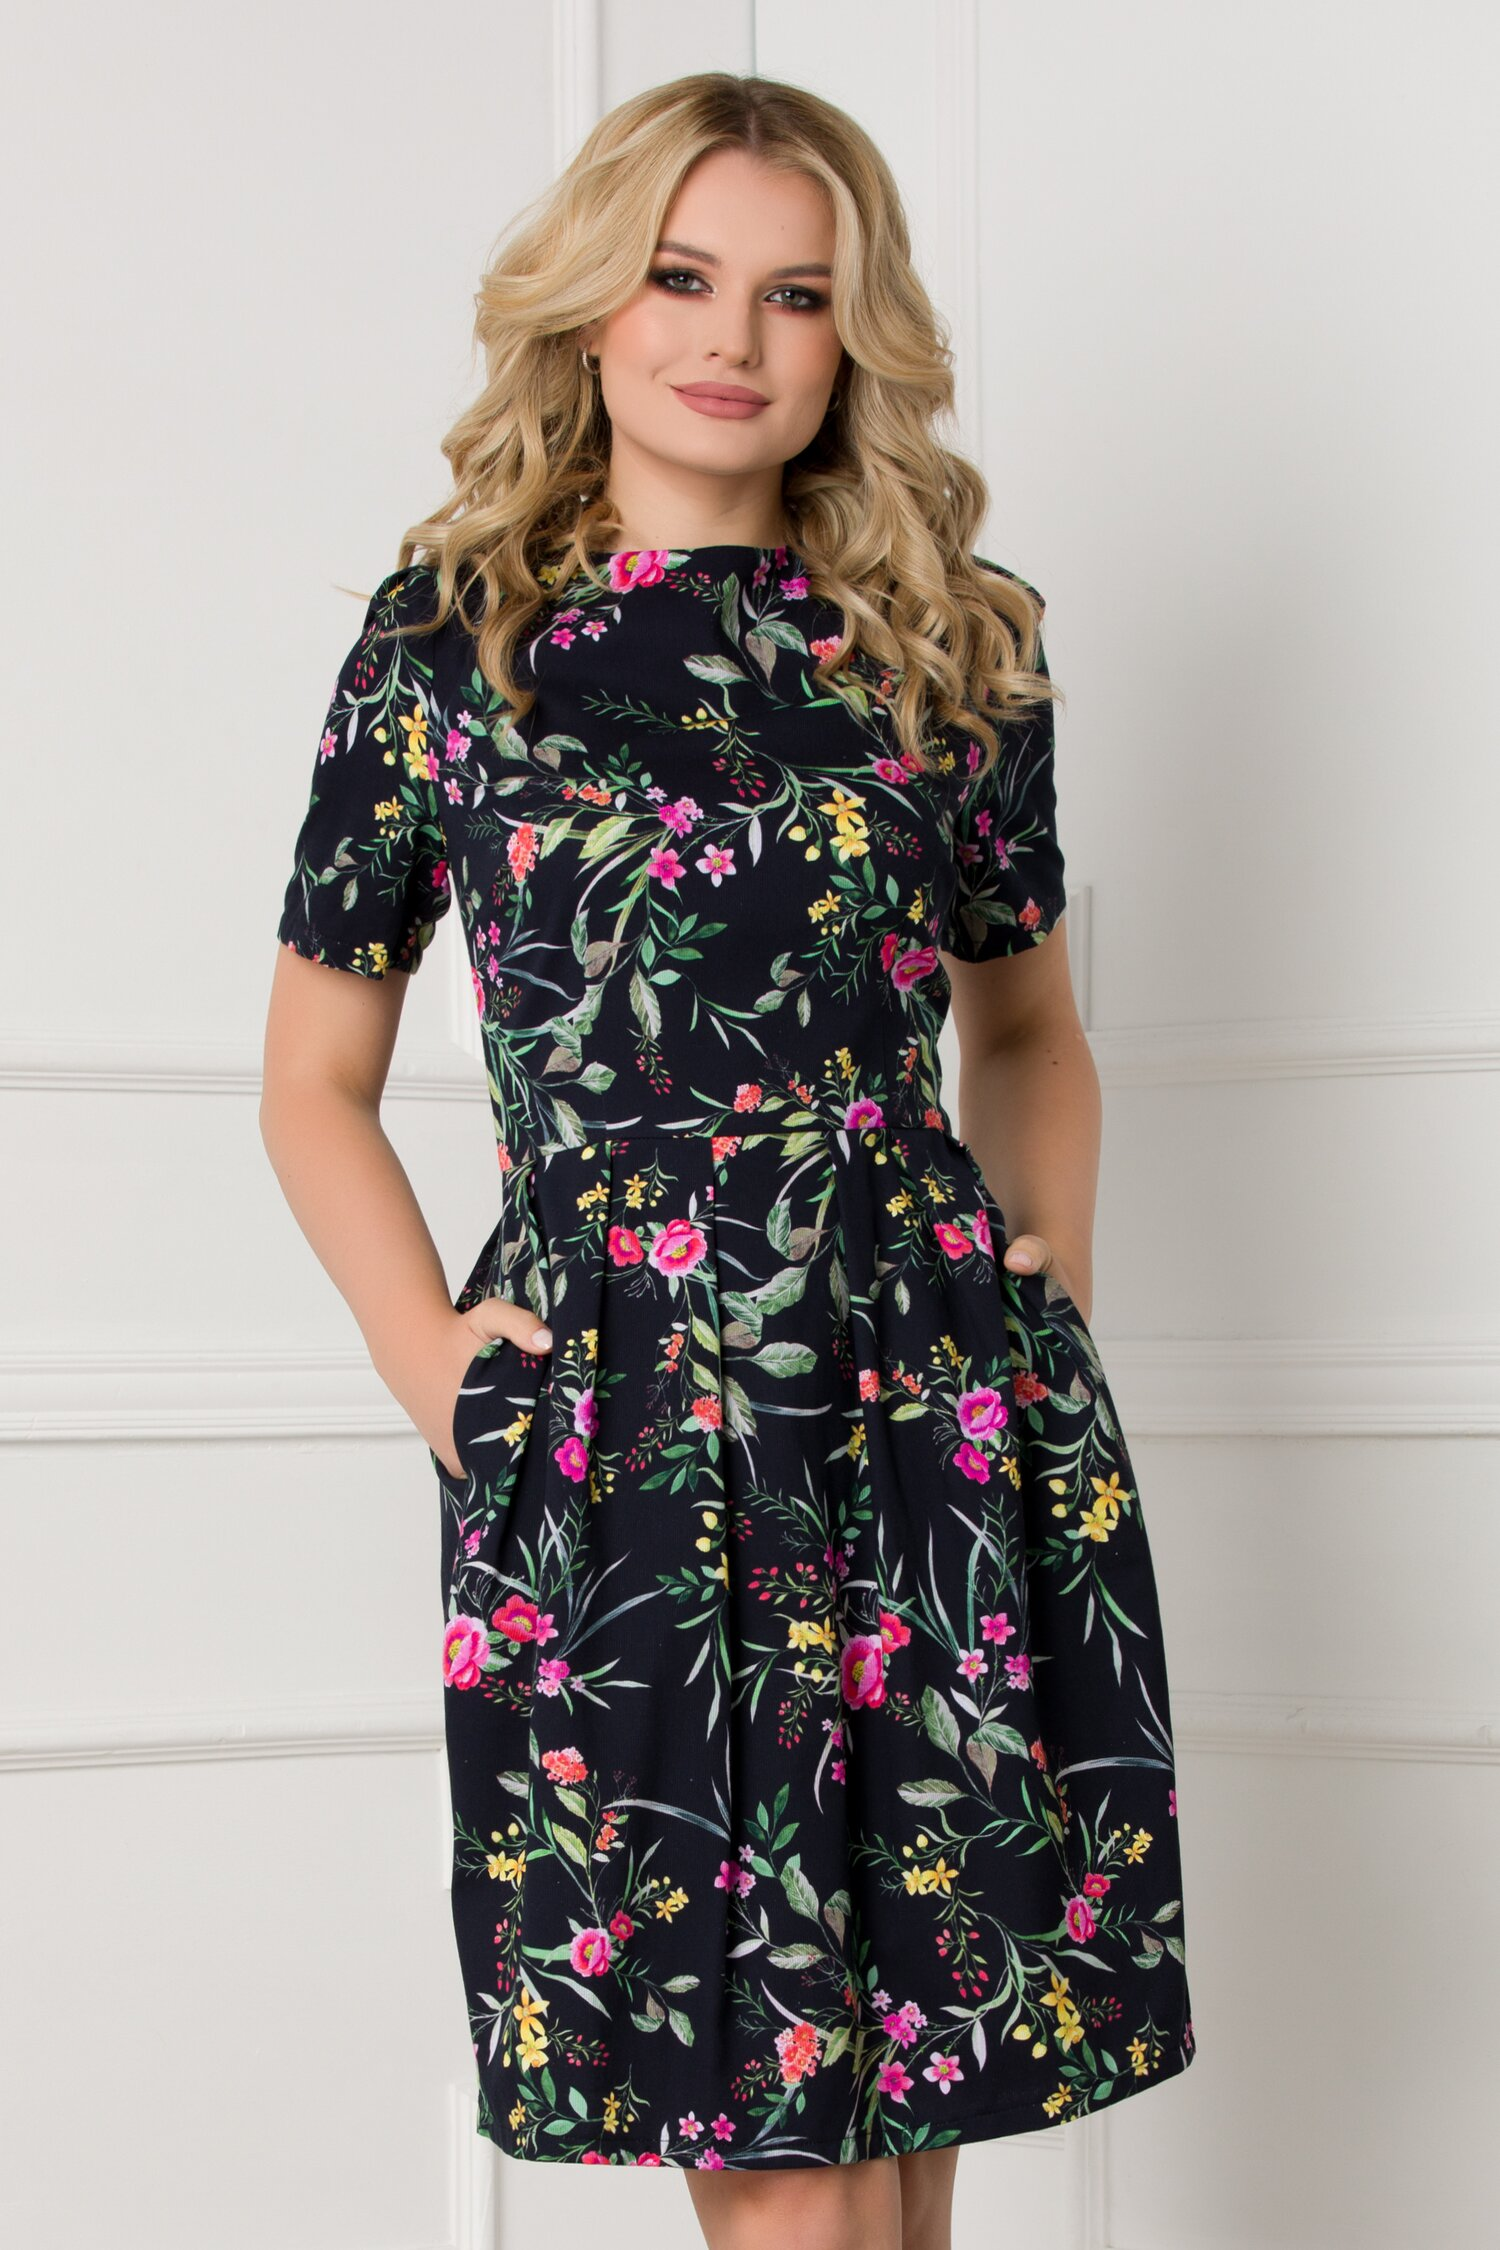 Rochie Iulia neagra cu imprimeuri florale